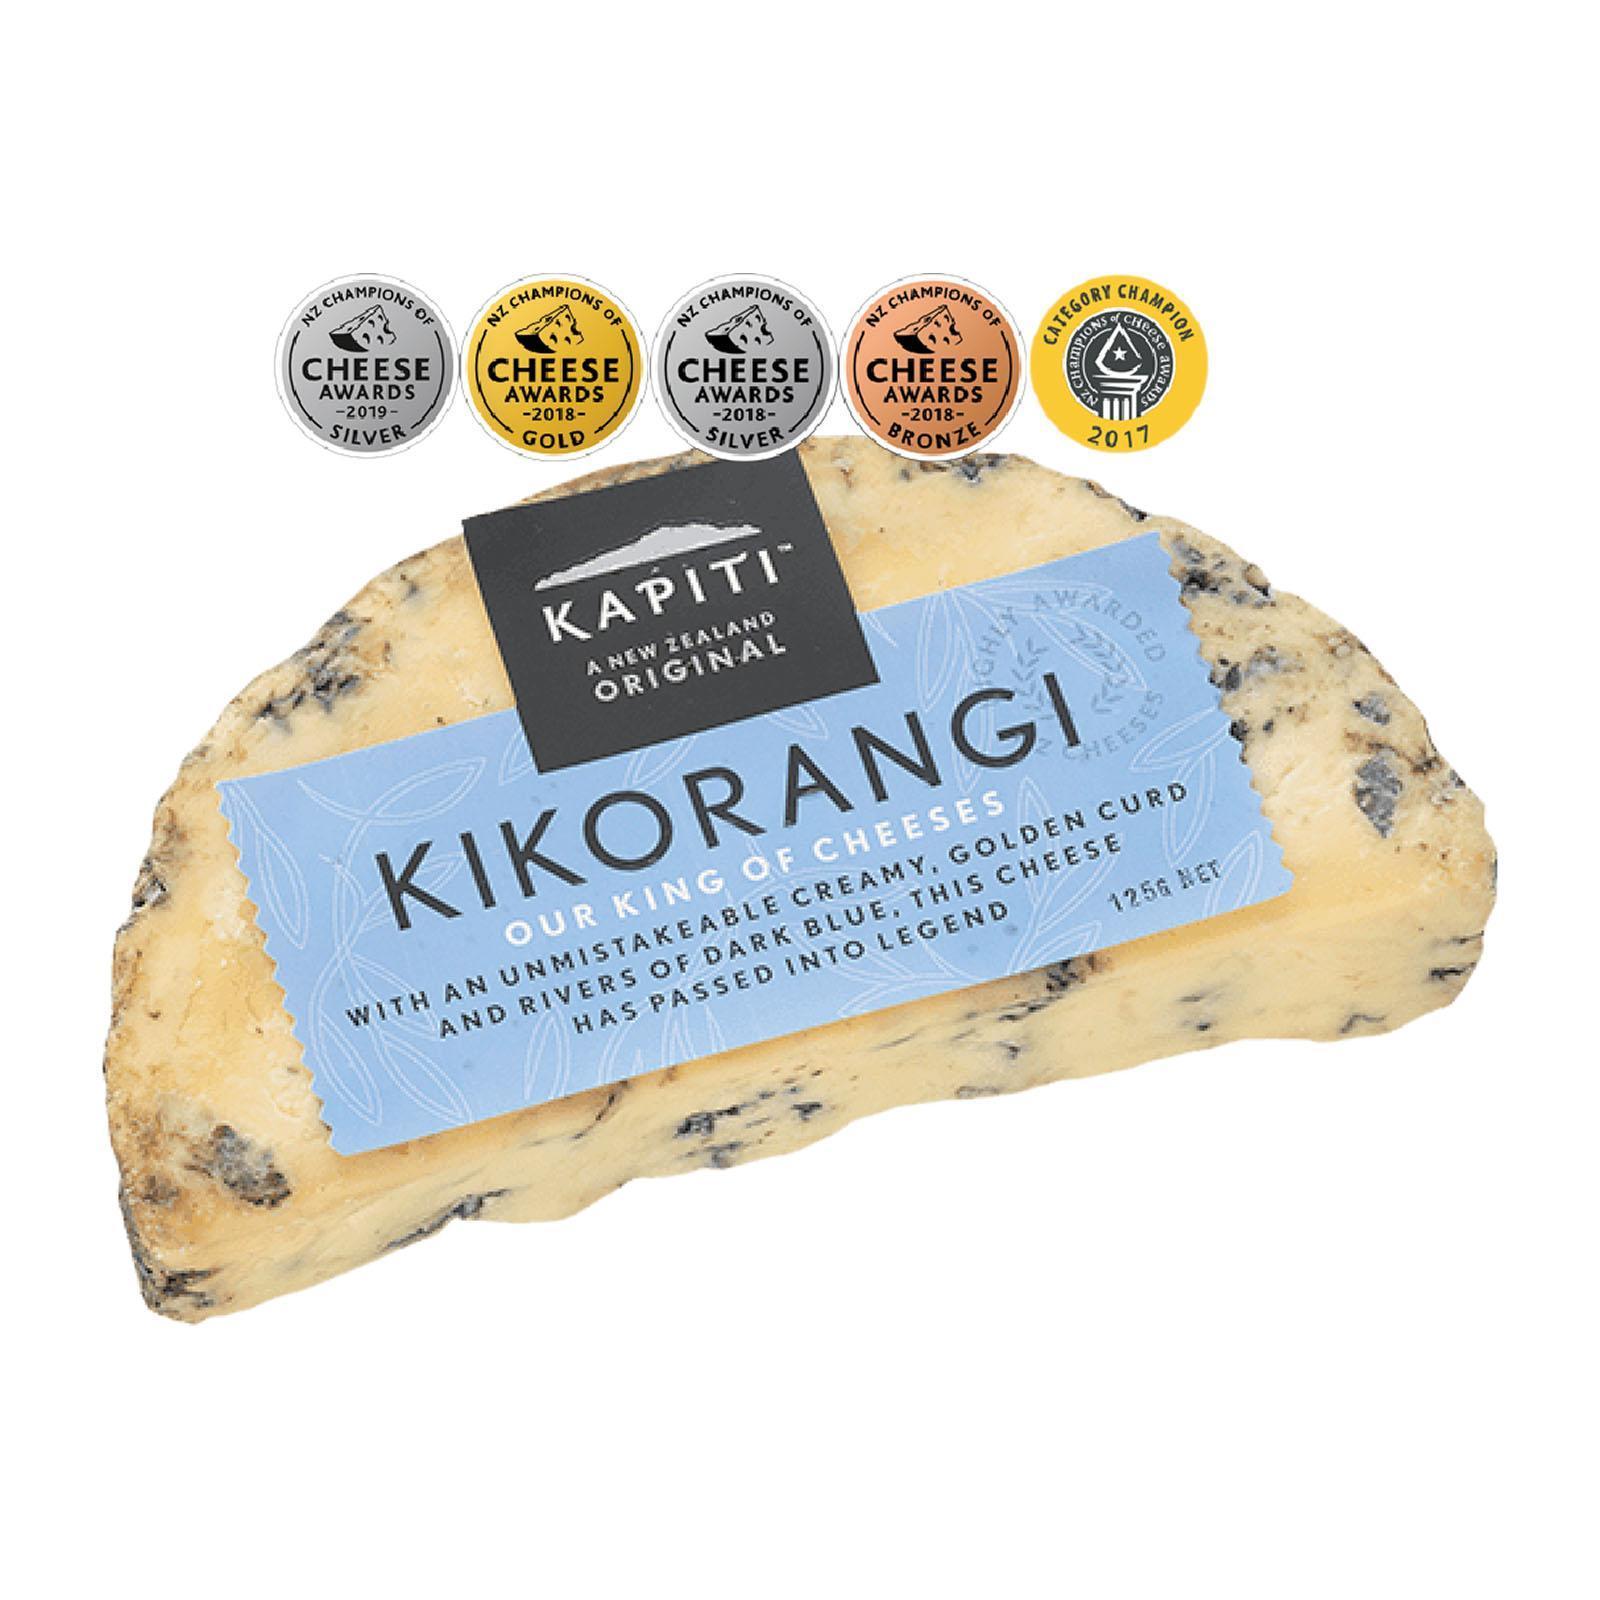 Kapiti Kikorangi Blue Cheese - The Cellar Door